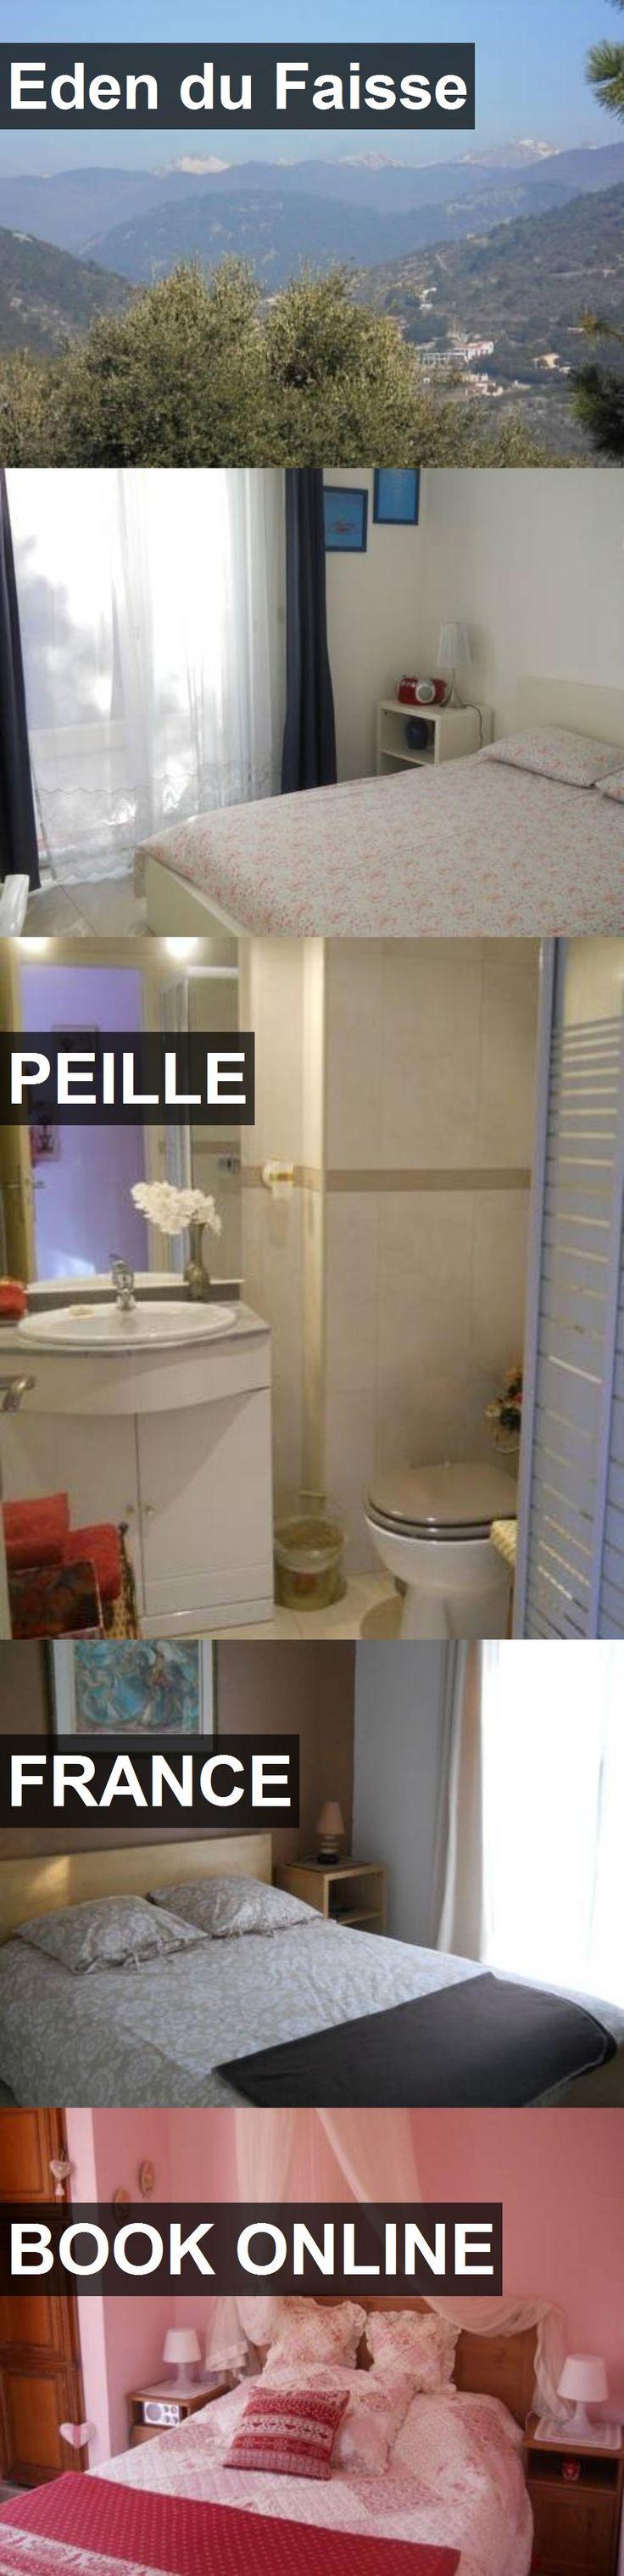 modern bathroom fountain valley reviews%0A Hotel Eden du Faisse in Peille  France  For more information  photos   reviews